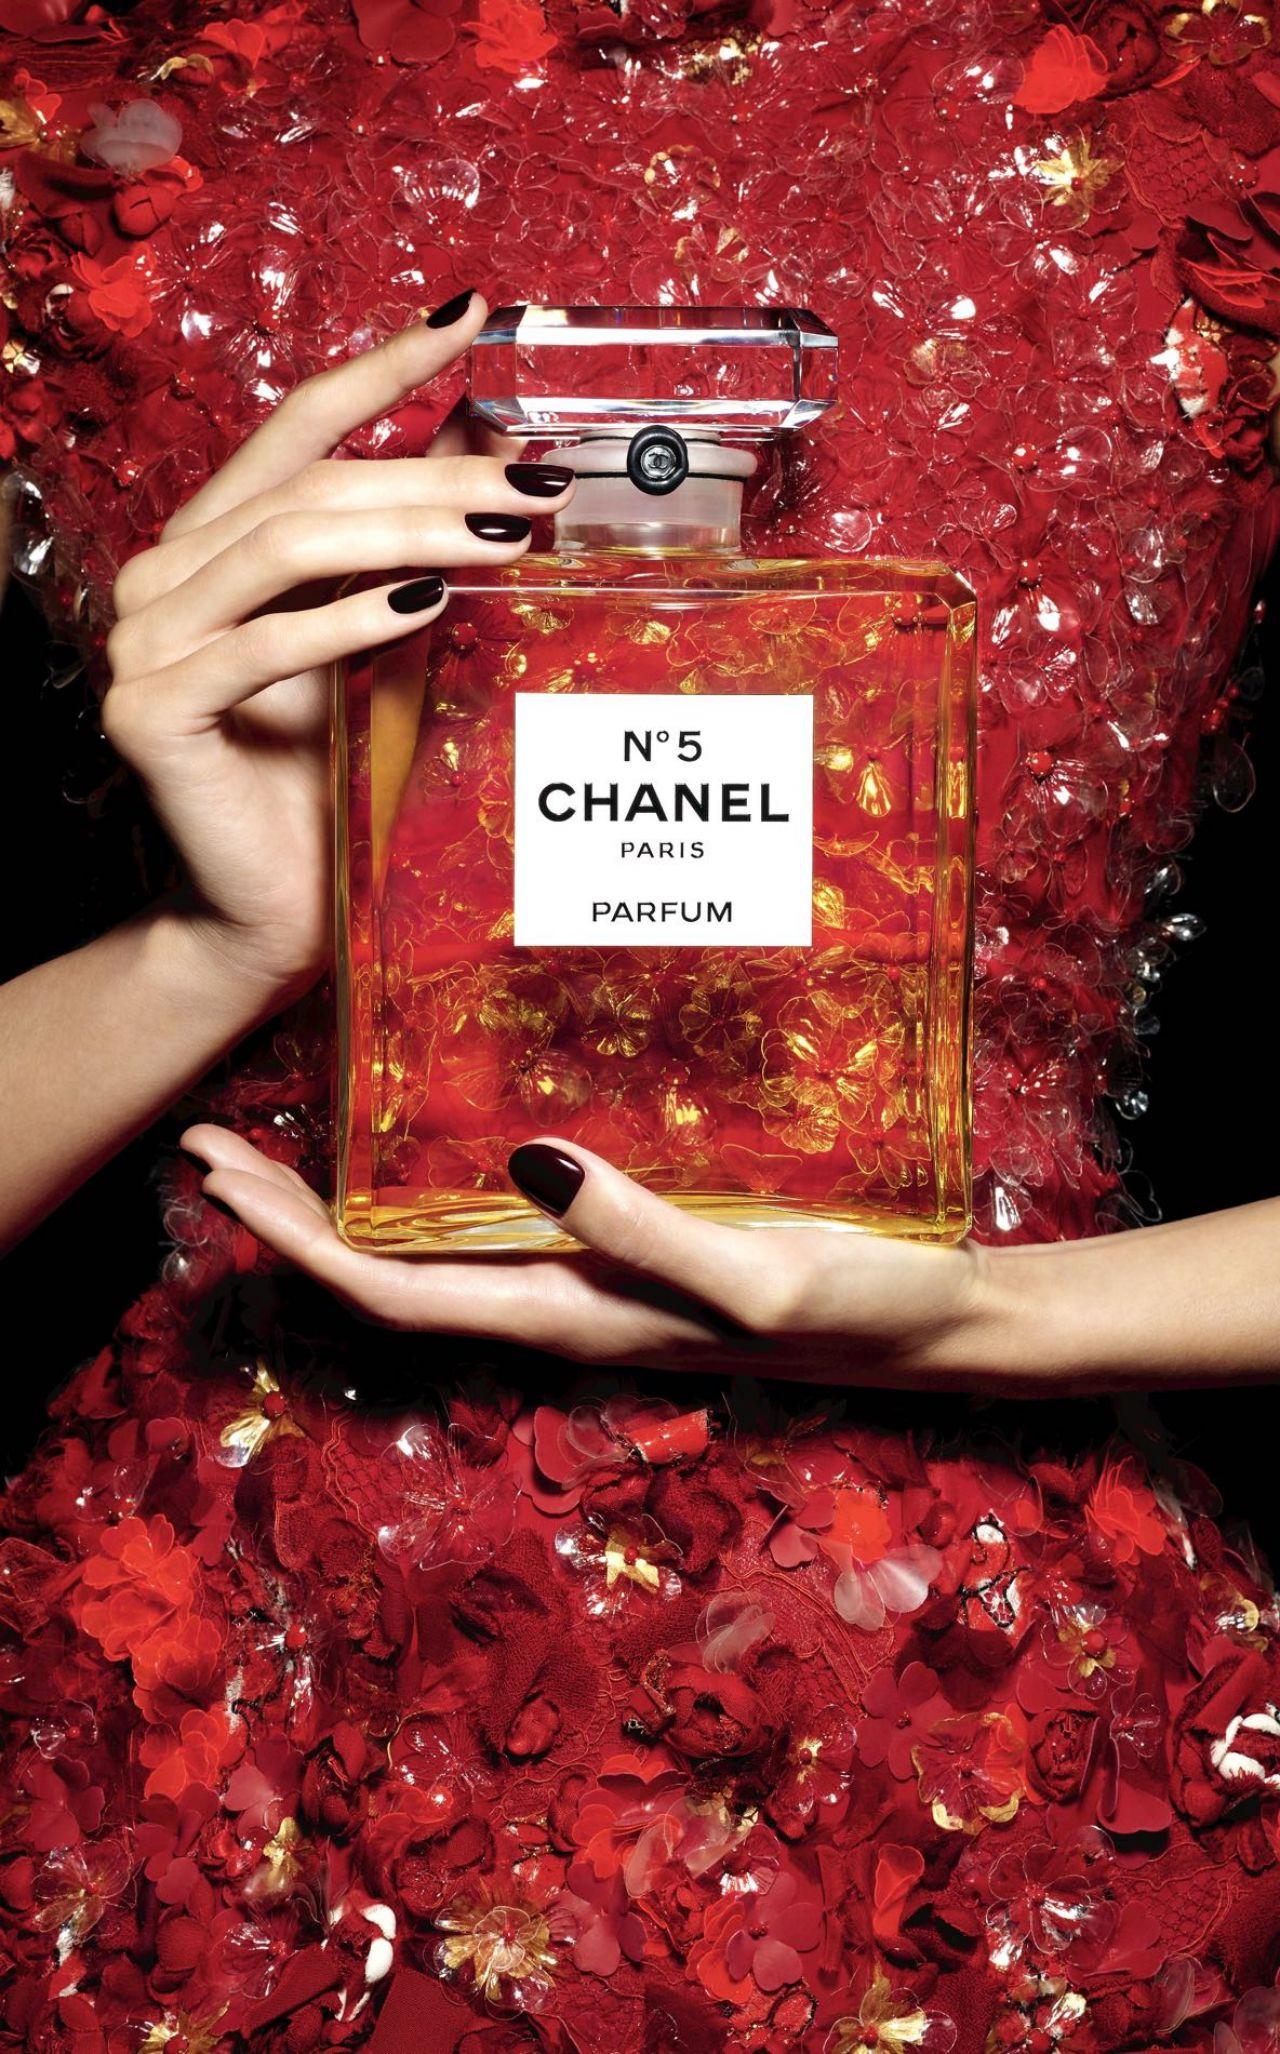 Gisele Bundchen Photoshoot For Chanel No 5 Fragrance